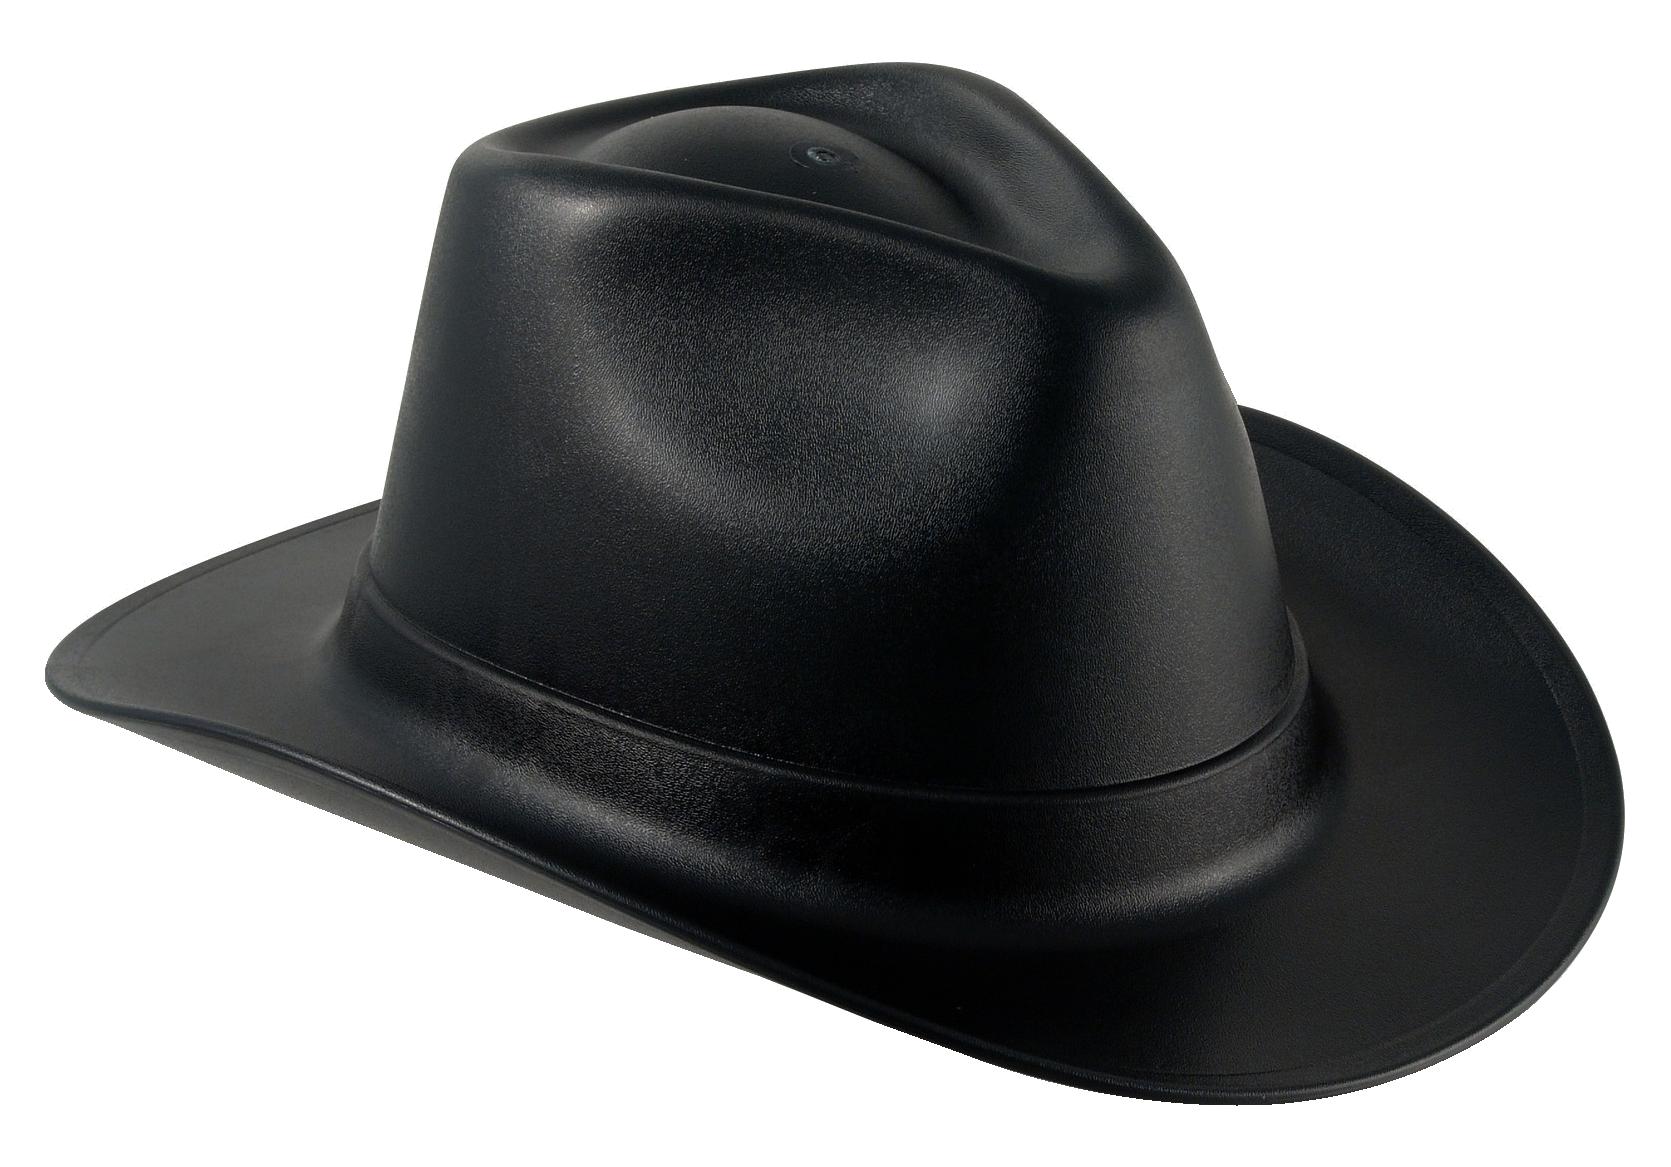 Cowboy Hat Png Image Cowboy Hats Hats Png